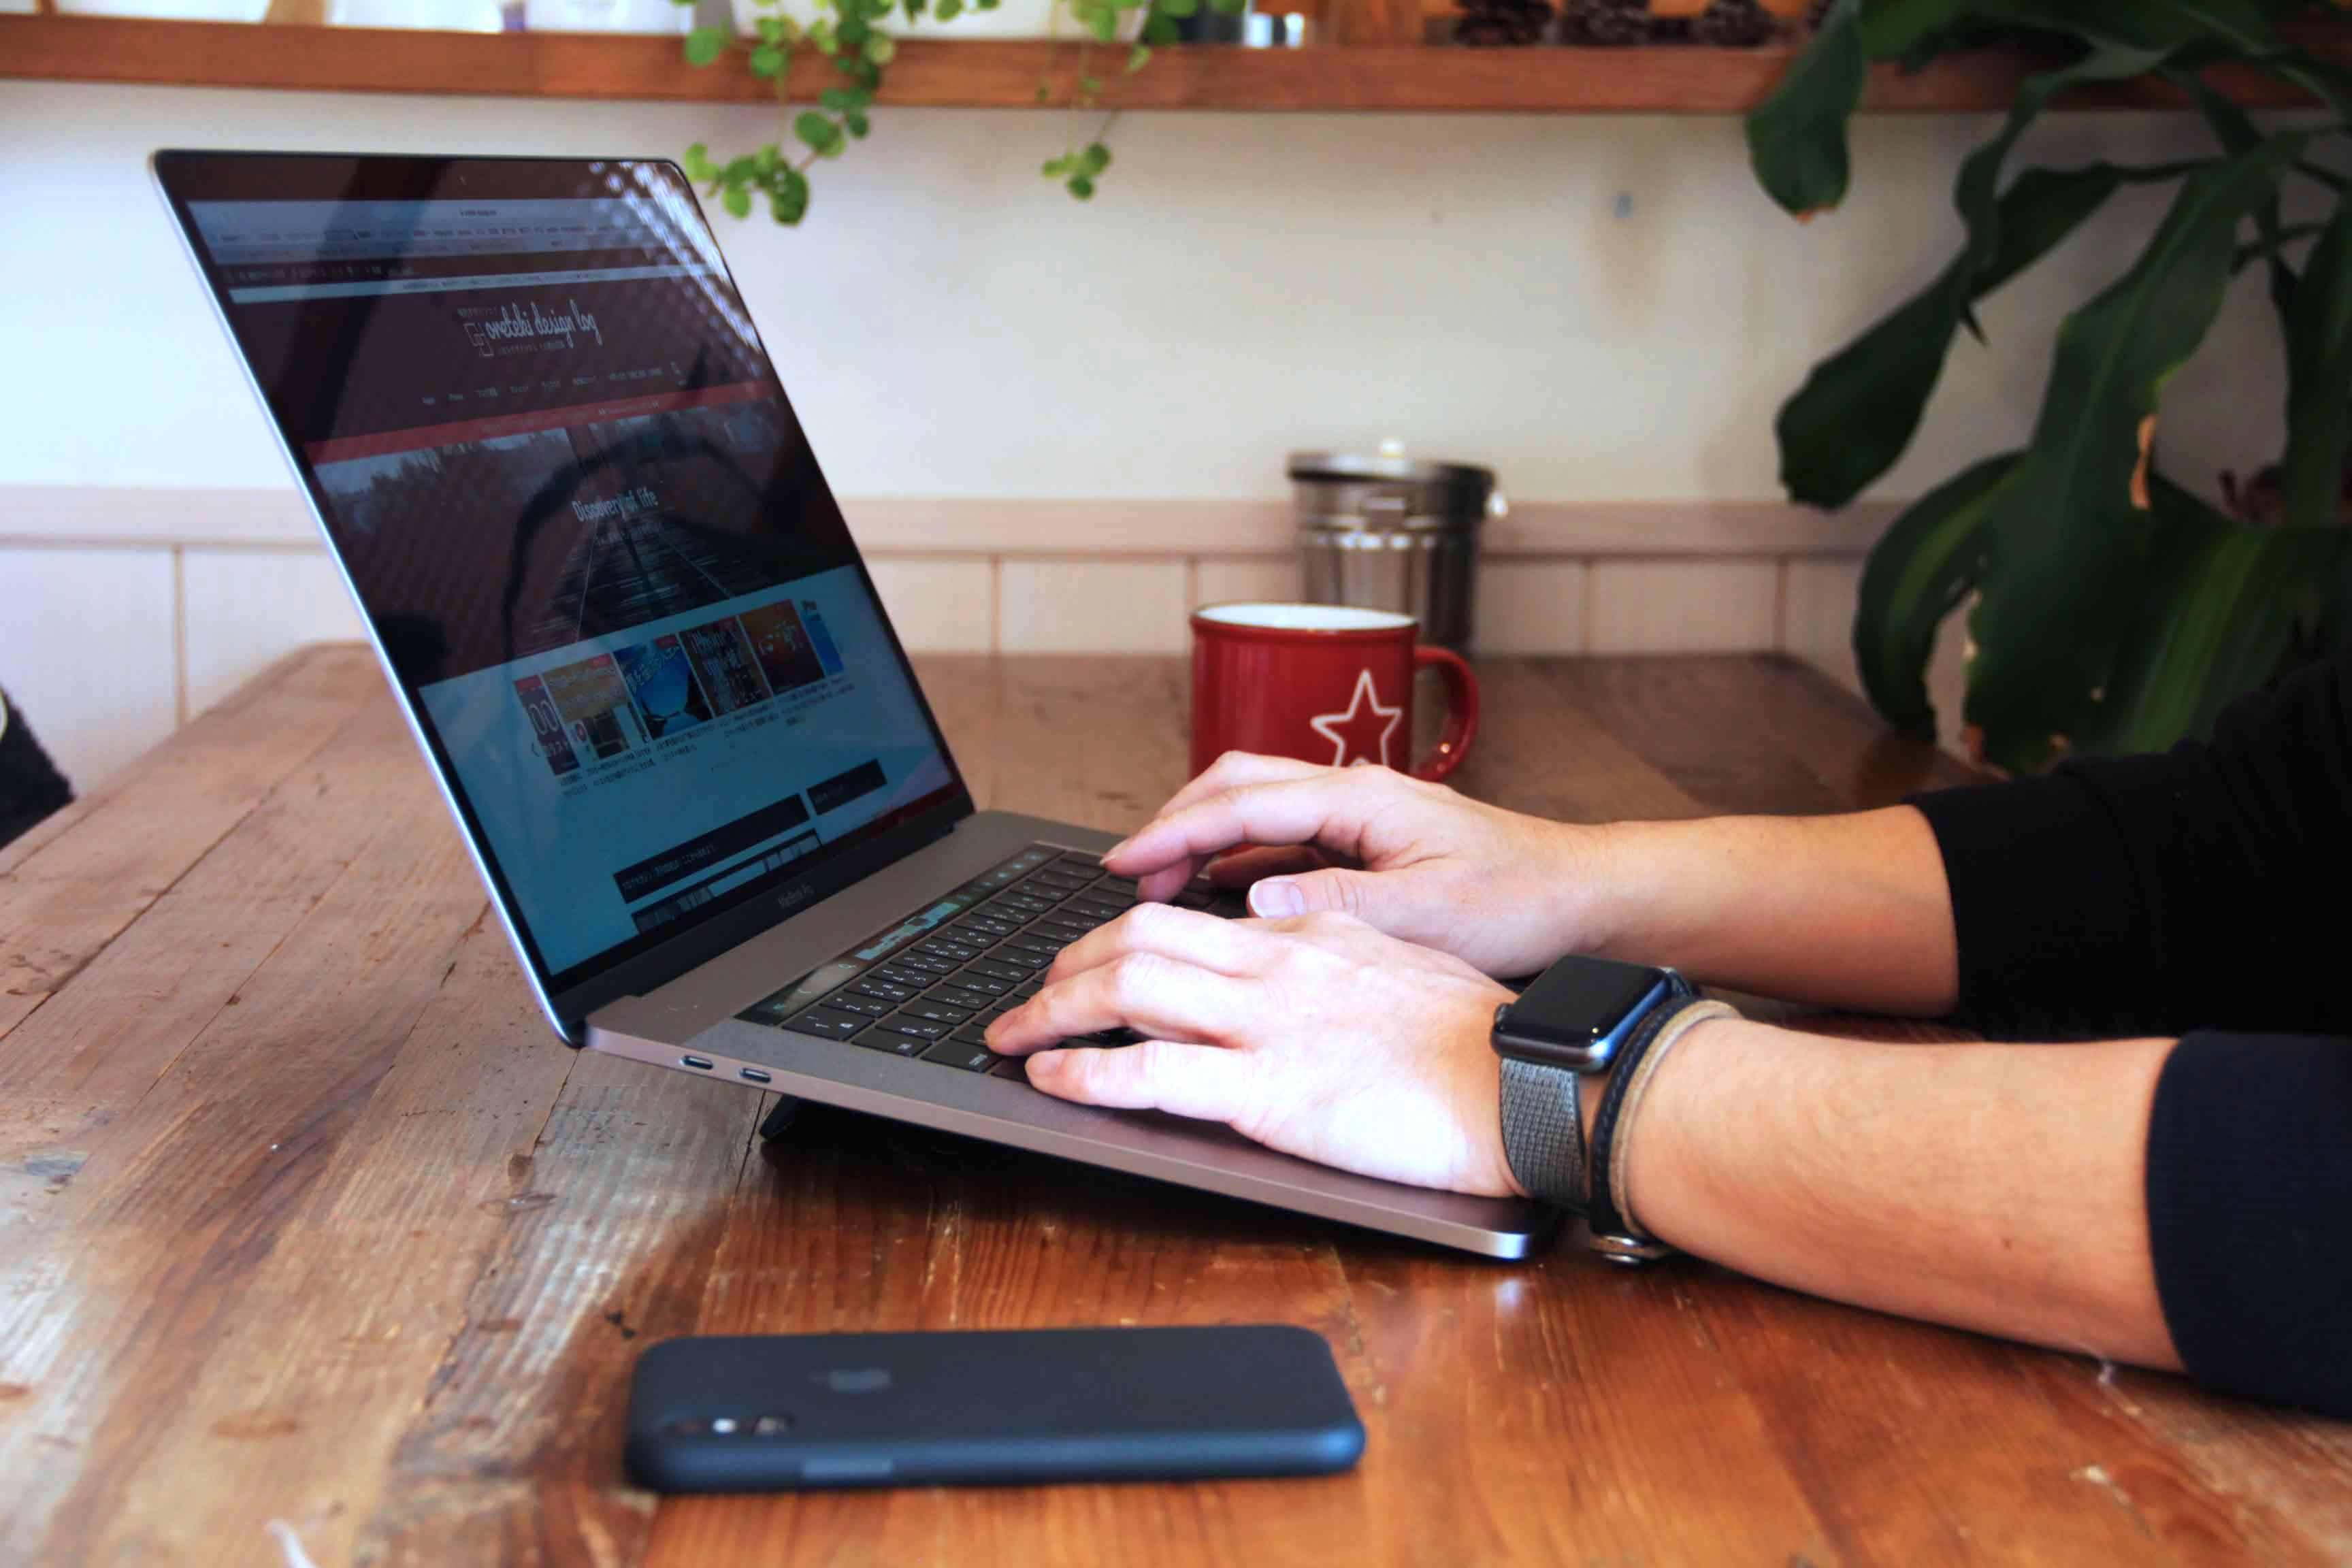 macbokkproにkickflip装着してキーボードタイピングしている写真